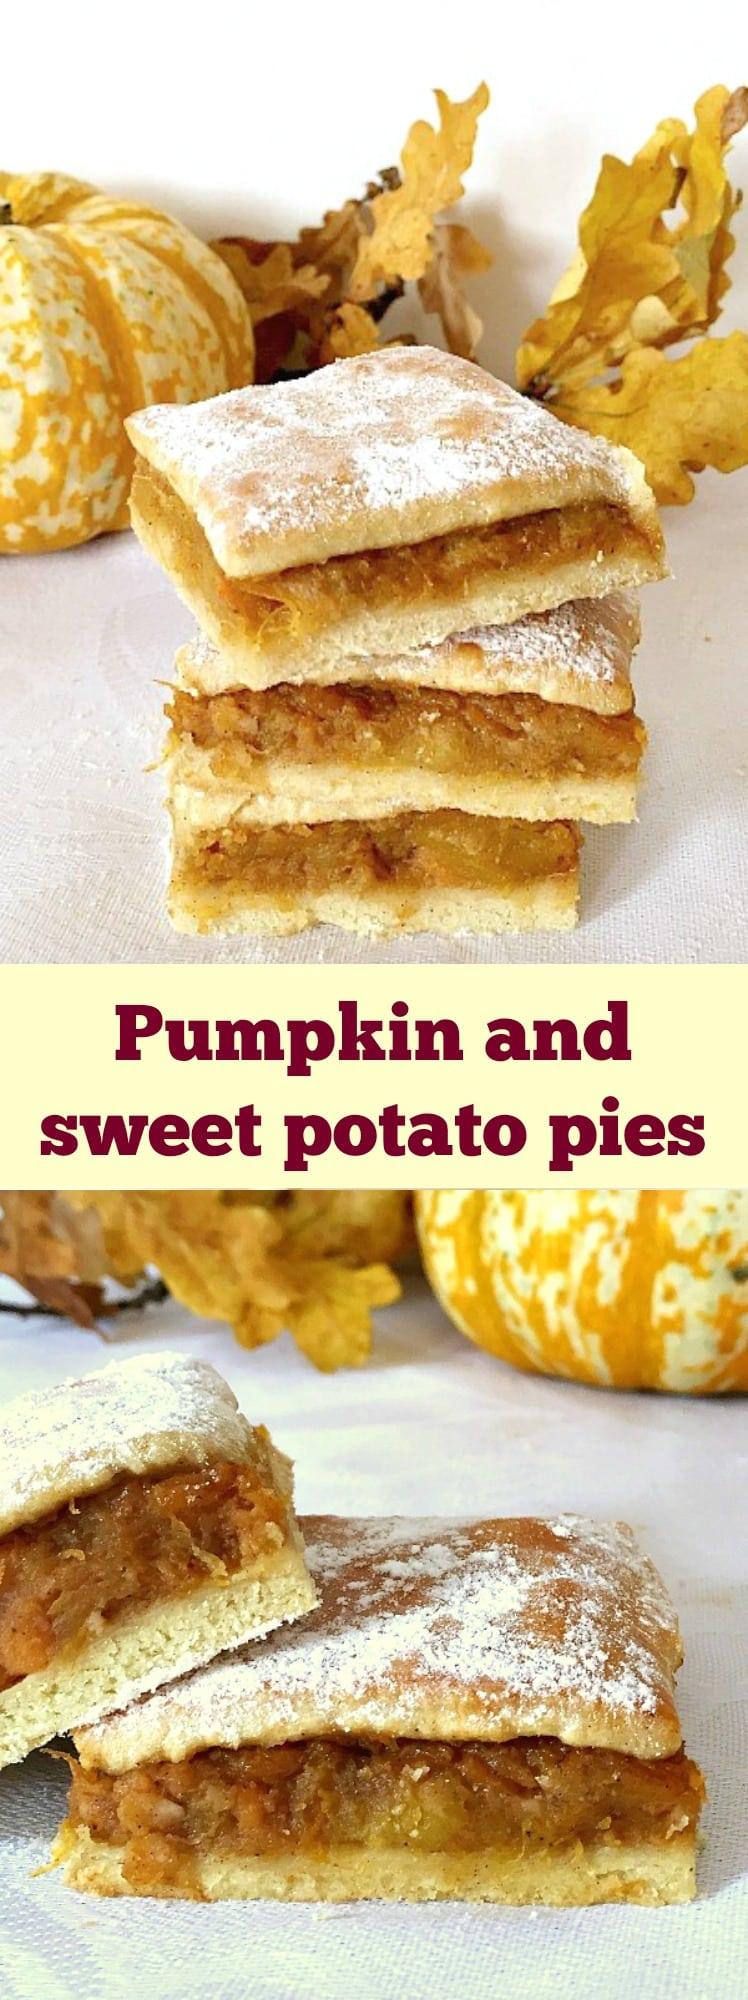 Pumpkin and sweet potato pies